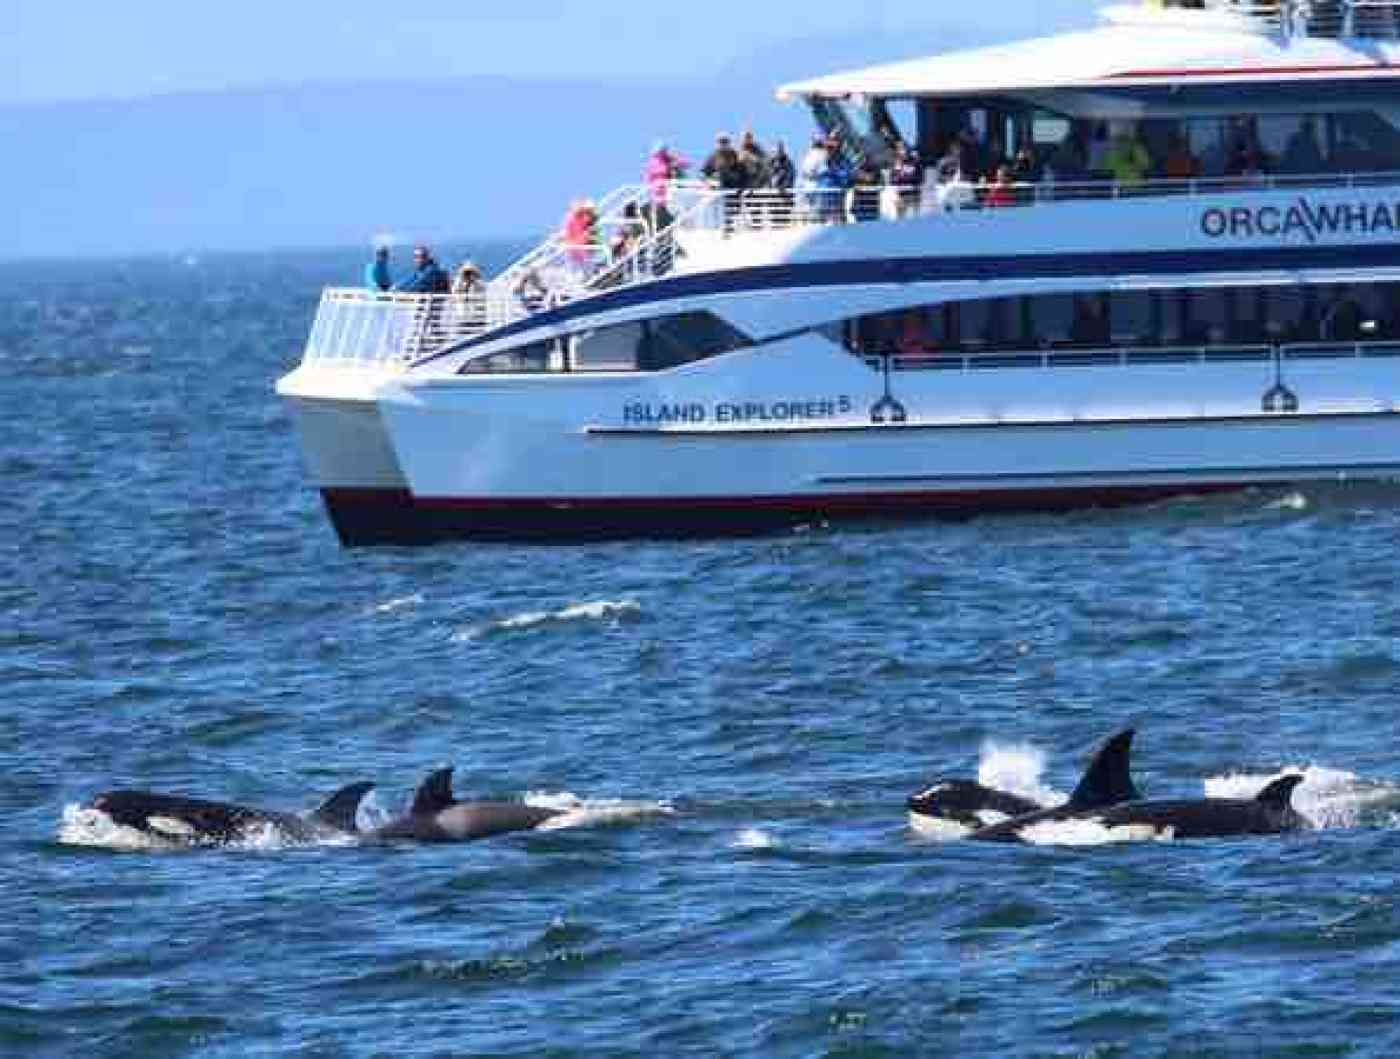 Anacortes Whale Watching Island Explorer 5